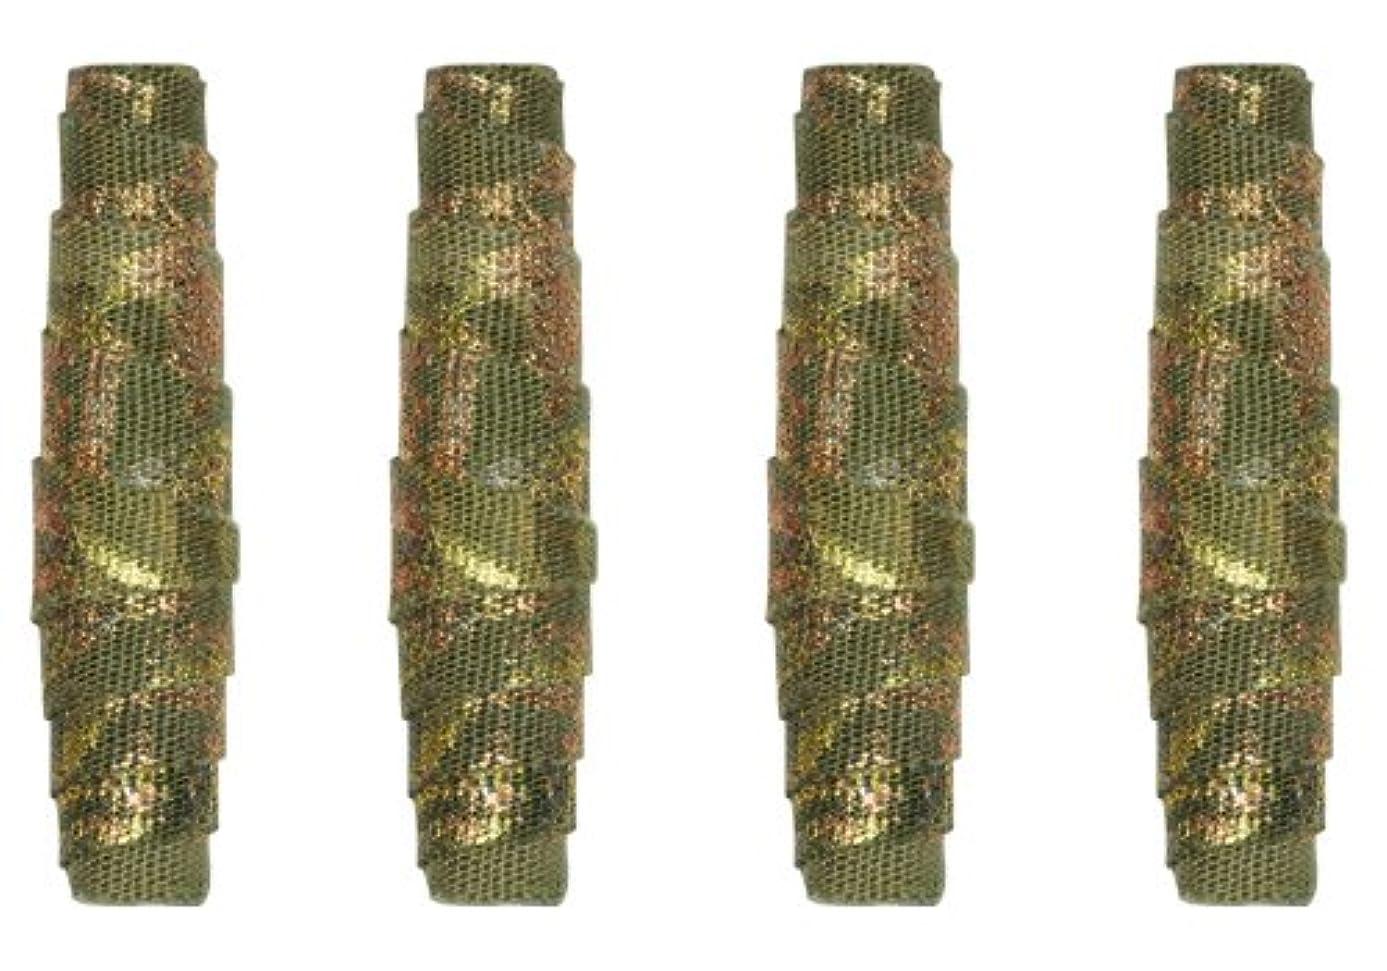 JHB International 361032 Kristal Wick Batik Beauties Fabric Beads 1-Inch Khaki